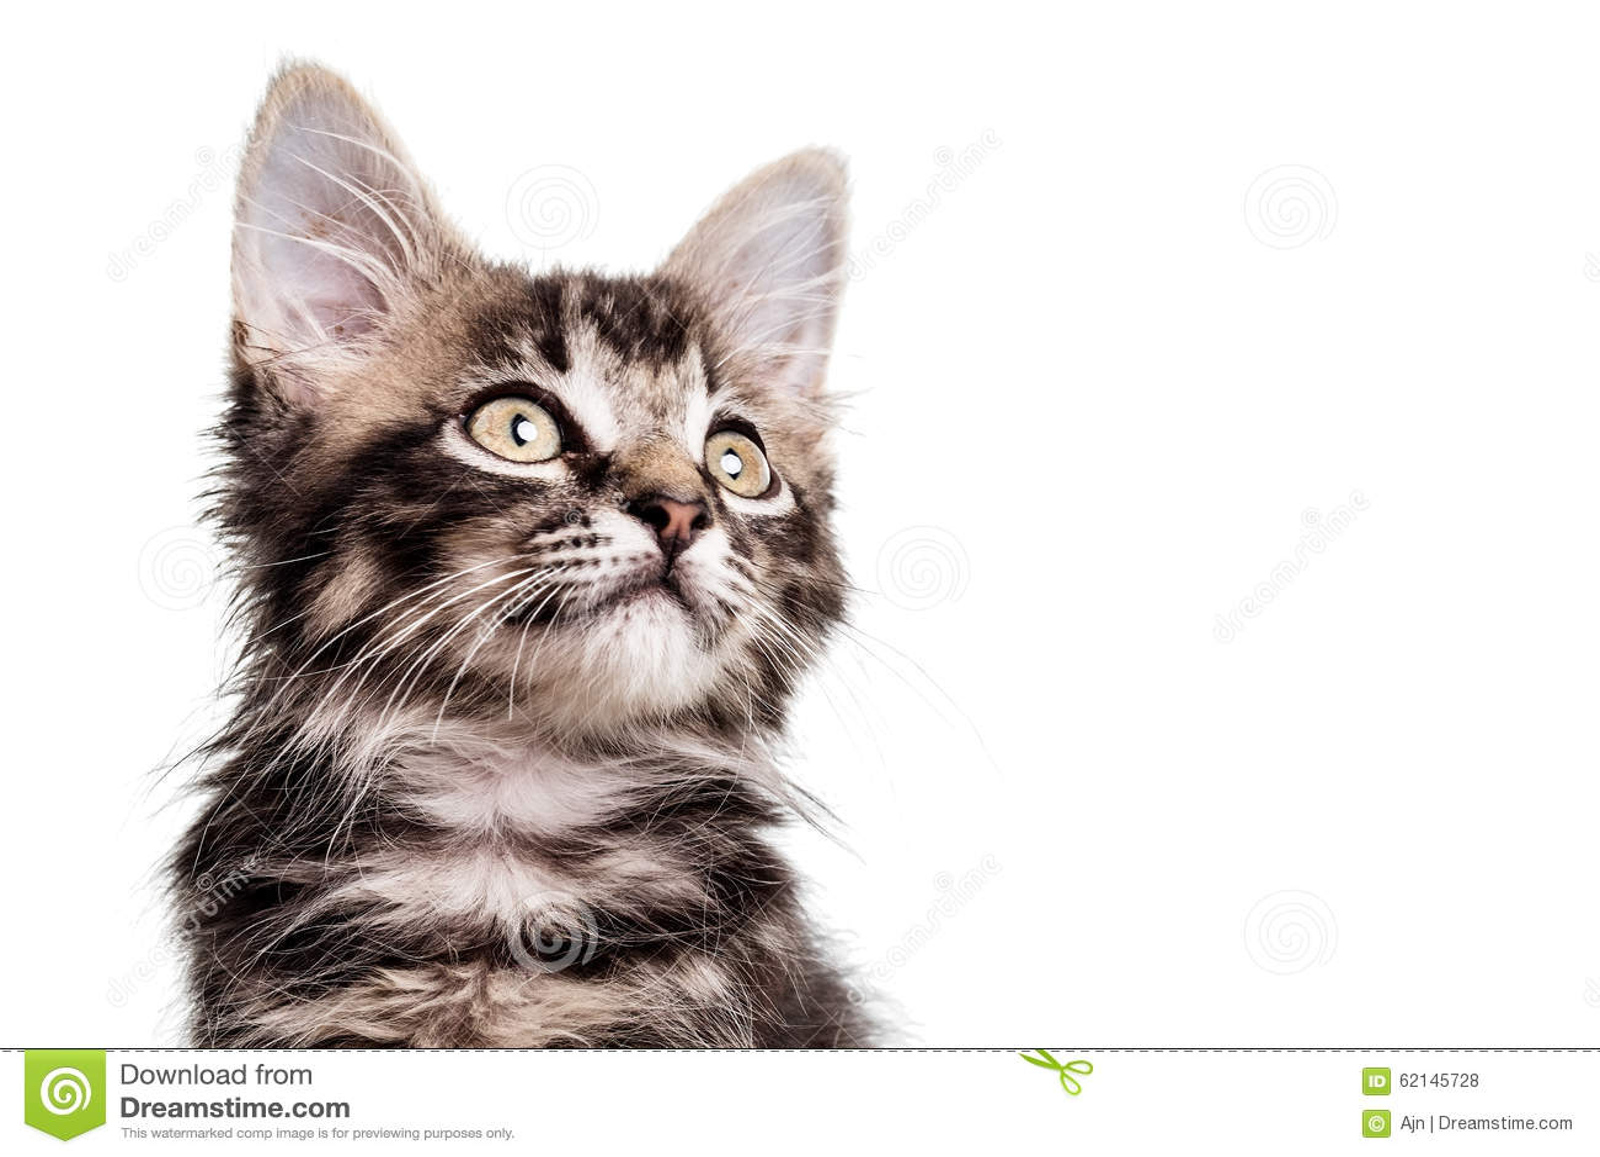 Cute Furry Kitten close up